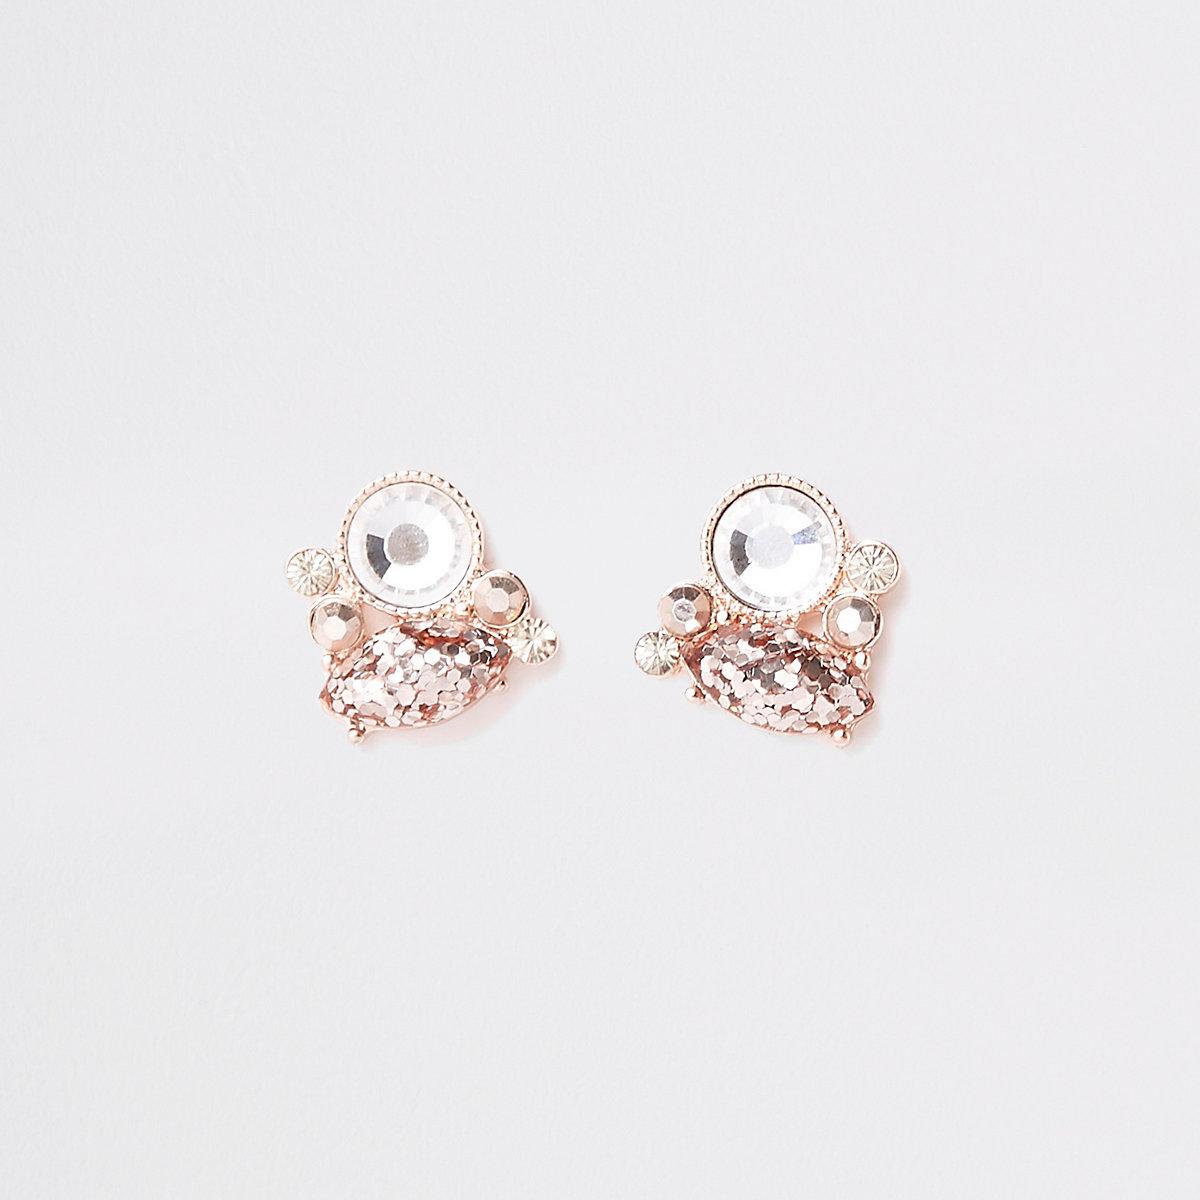 Rose gold tone rhinestone cluster stud earrings